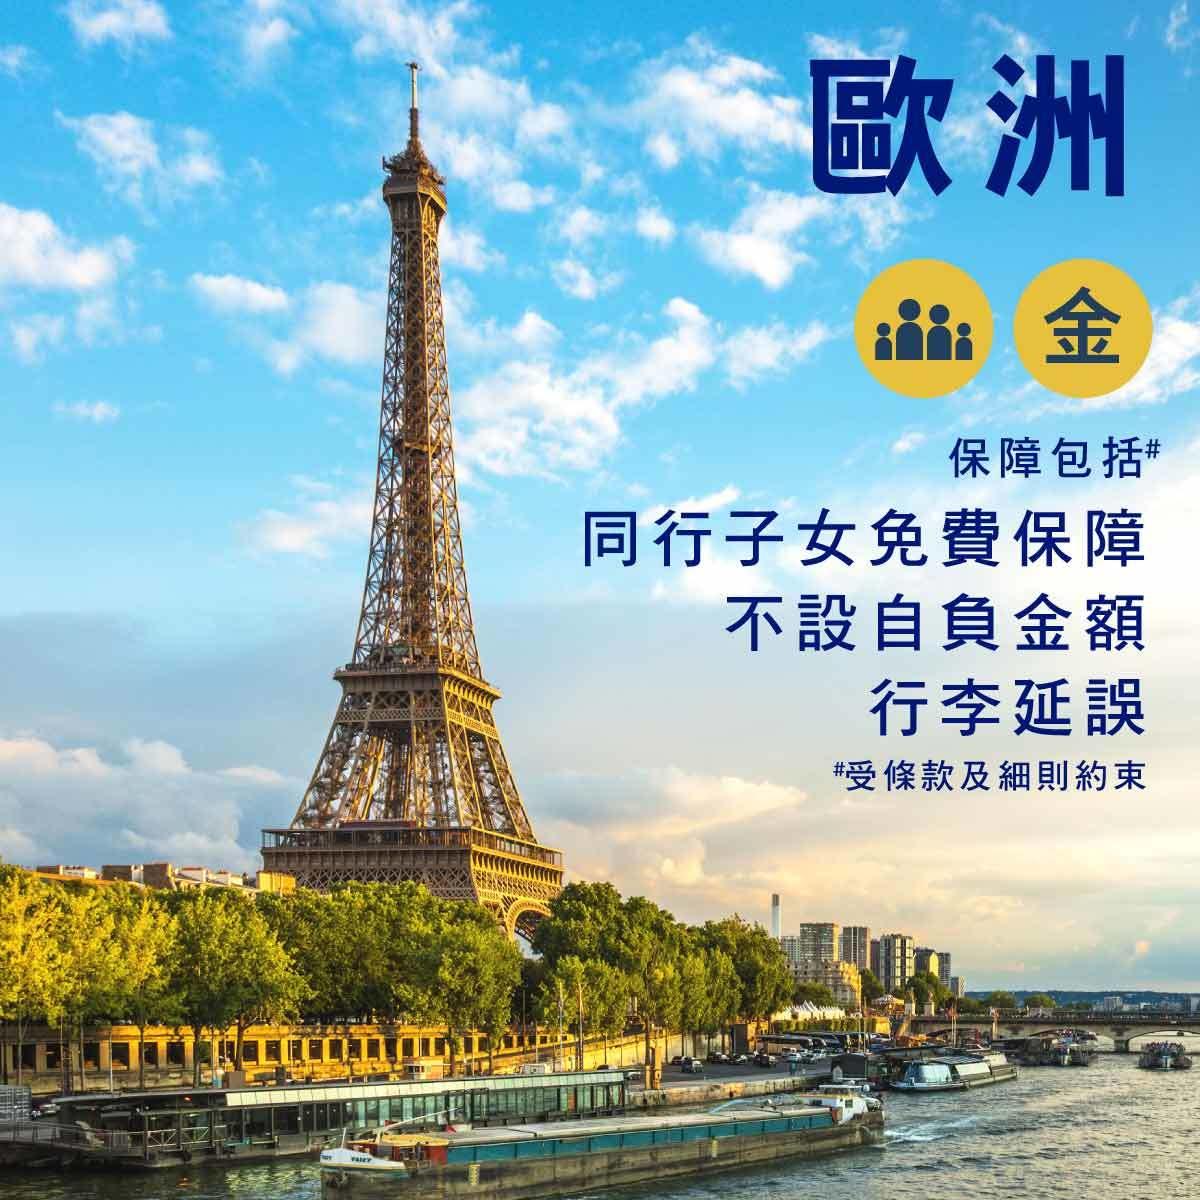 Europe - Single Trip Family Travel Insurance